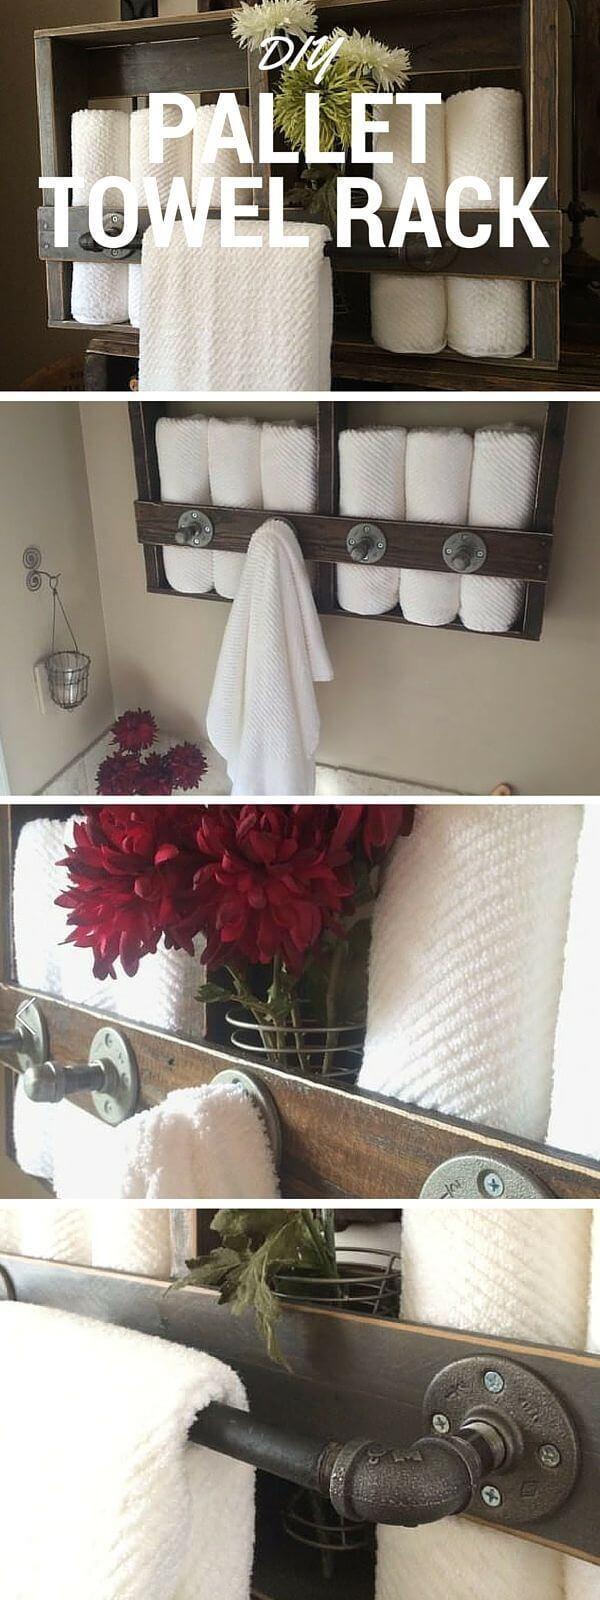 Rustic Repurposed Pallet Towel Rack